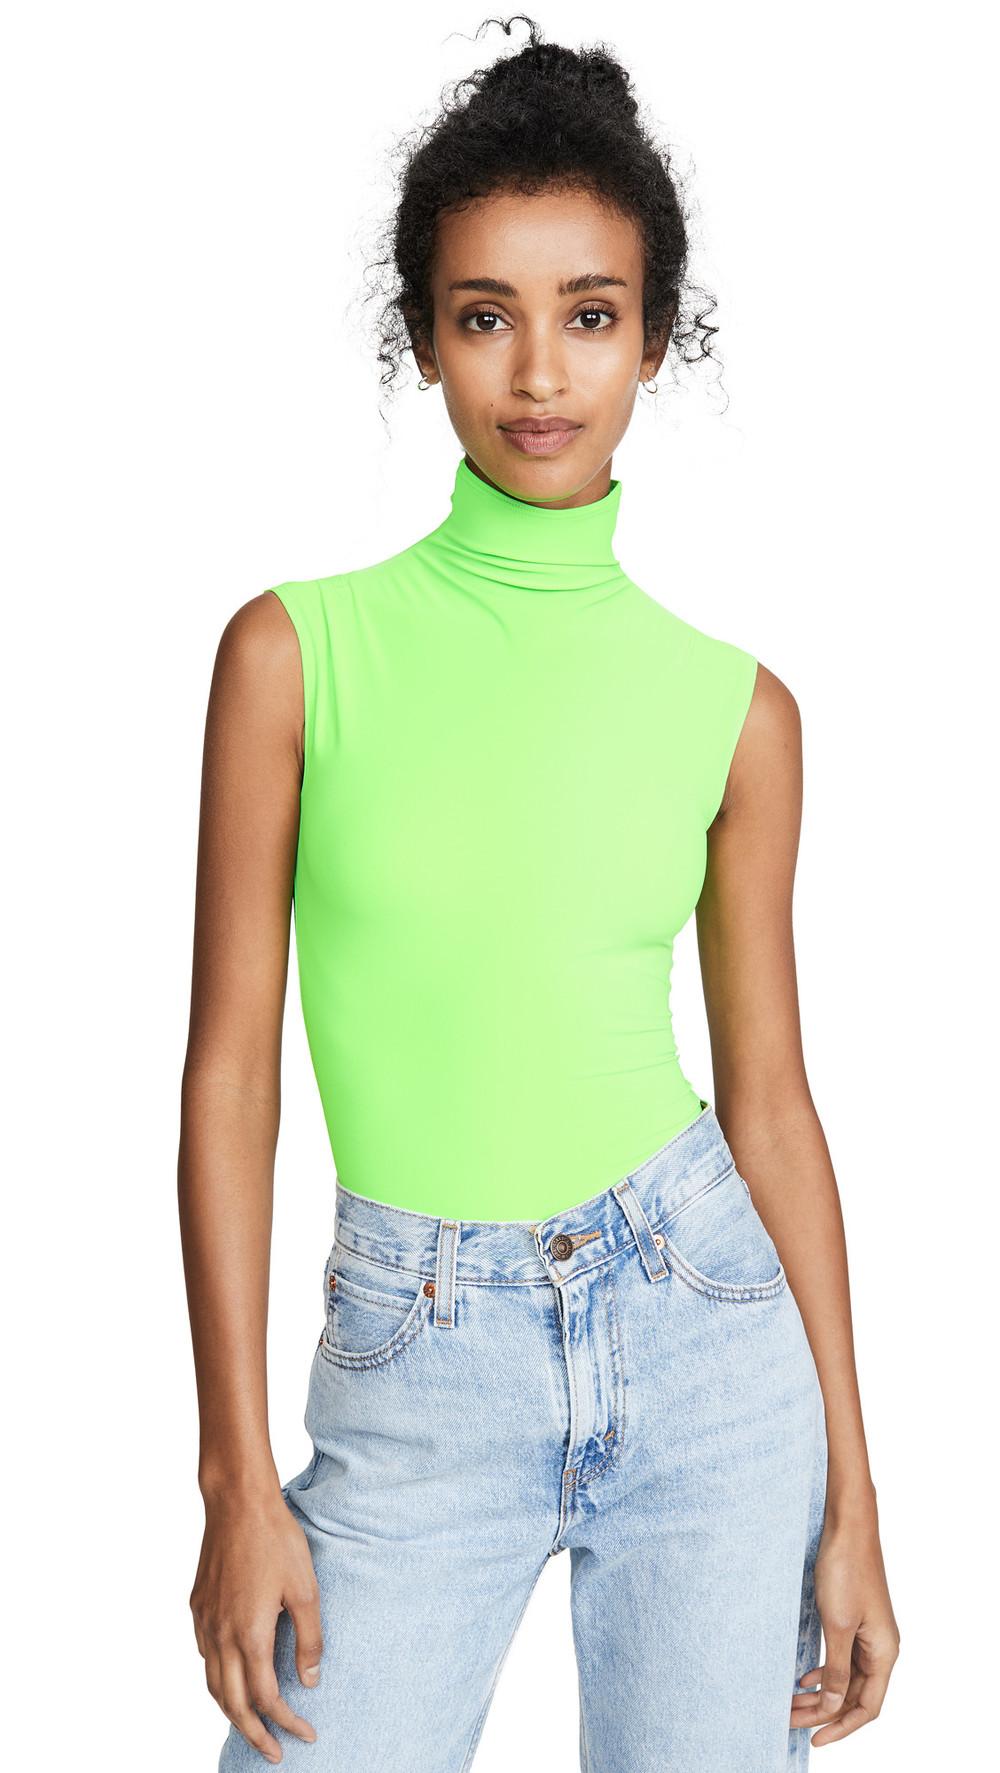 Alix Denton Thong Back Bodysuit in green